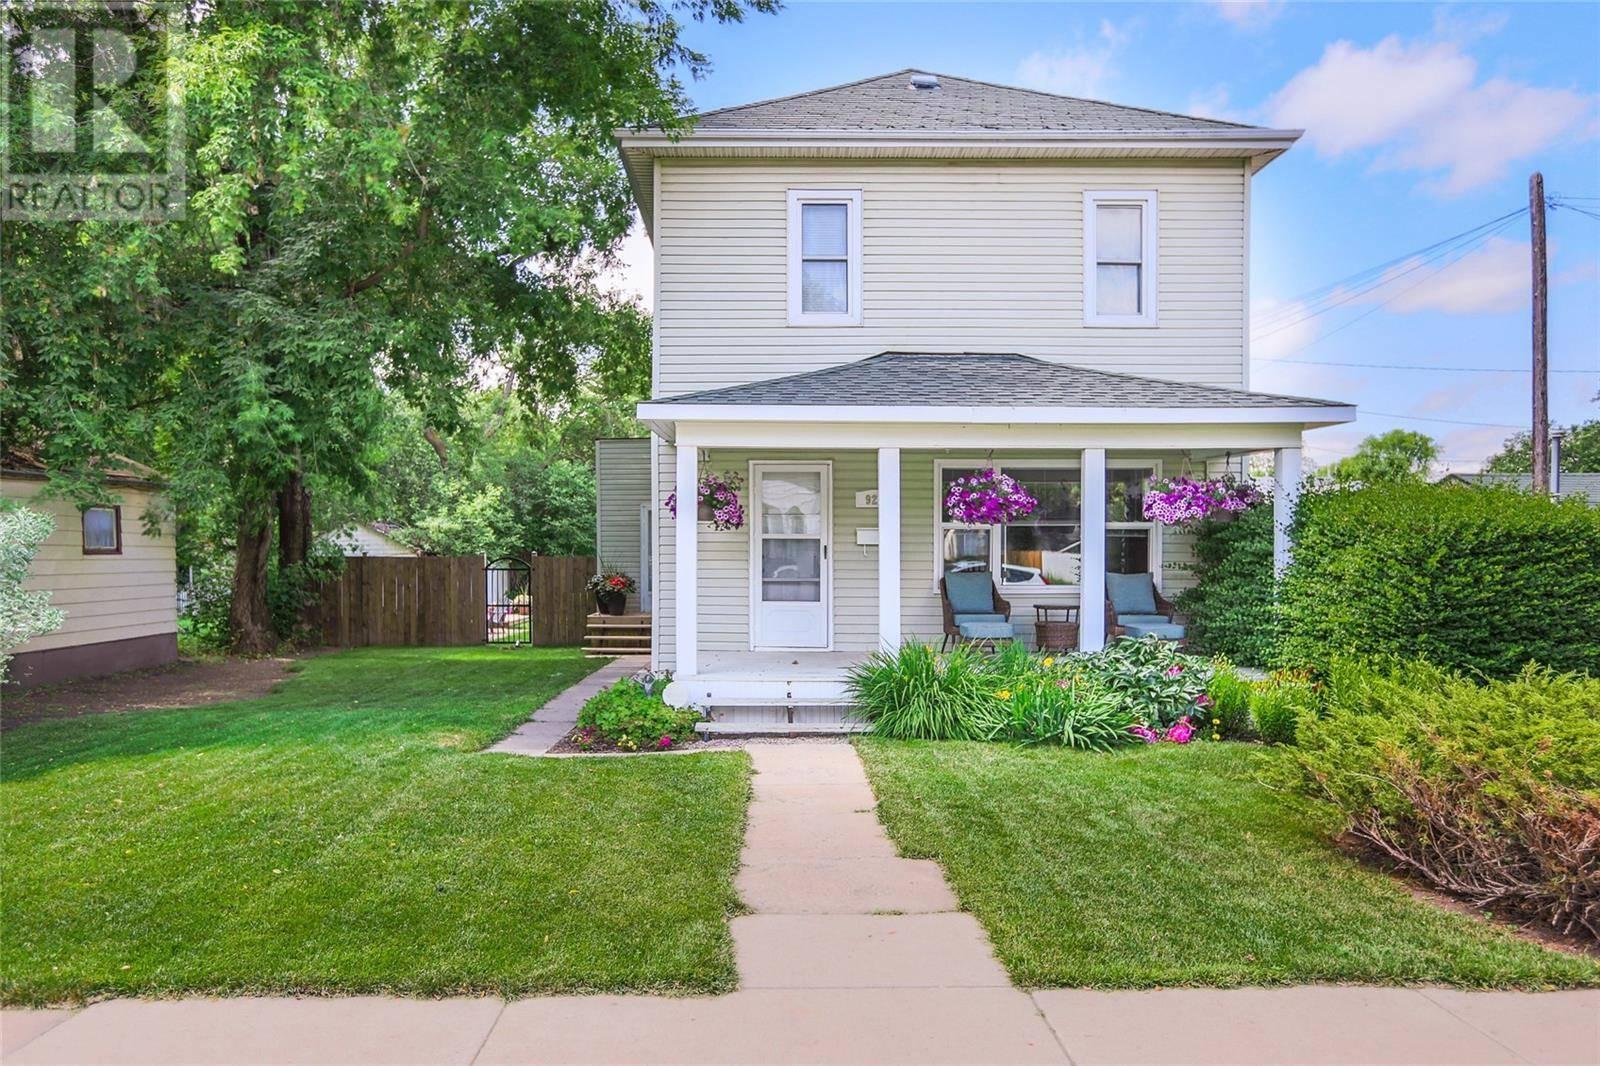 House for sale at 927 G Ave N Saskatoon Saskatchewan - MLS: SK789359